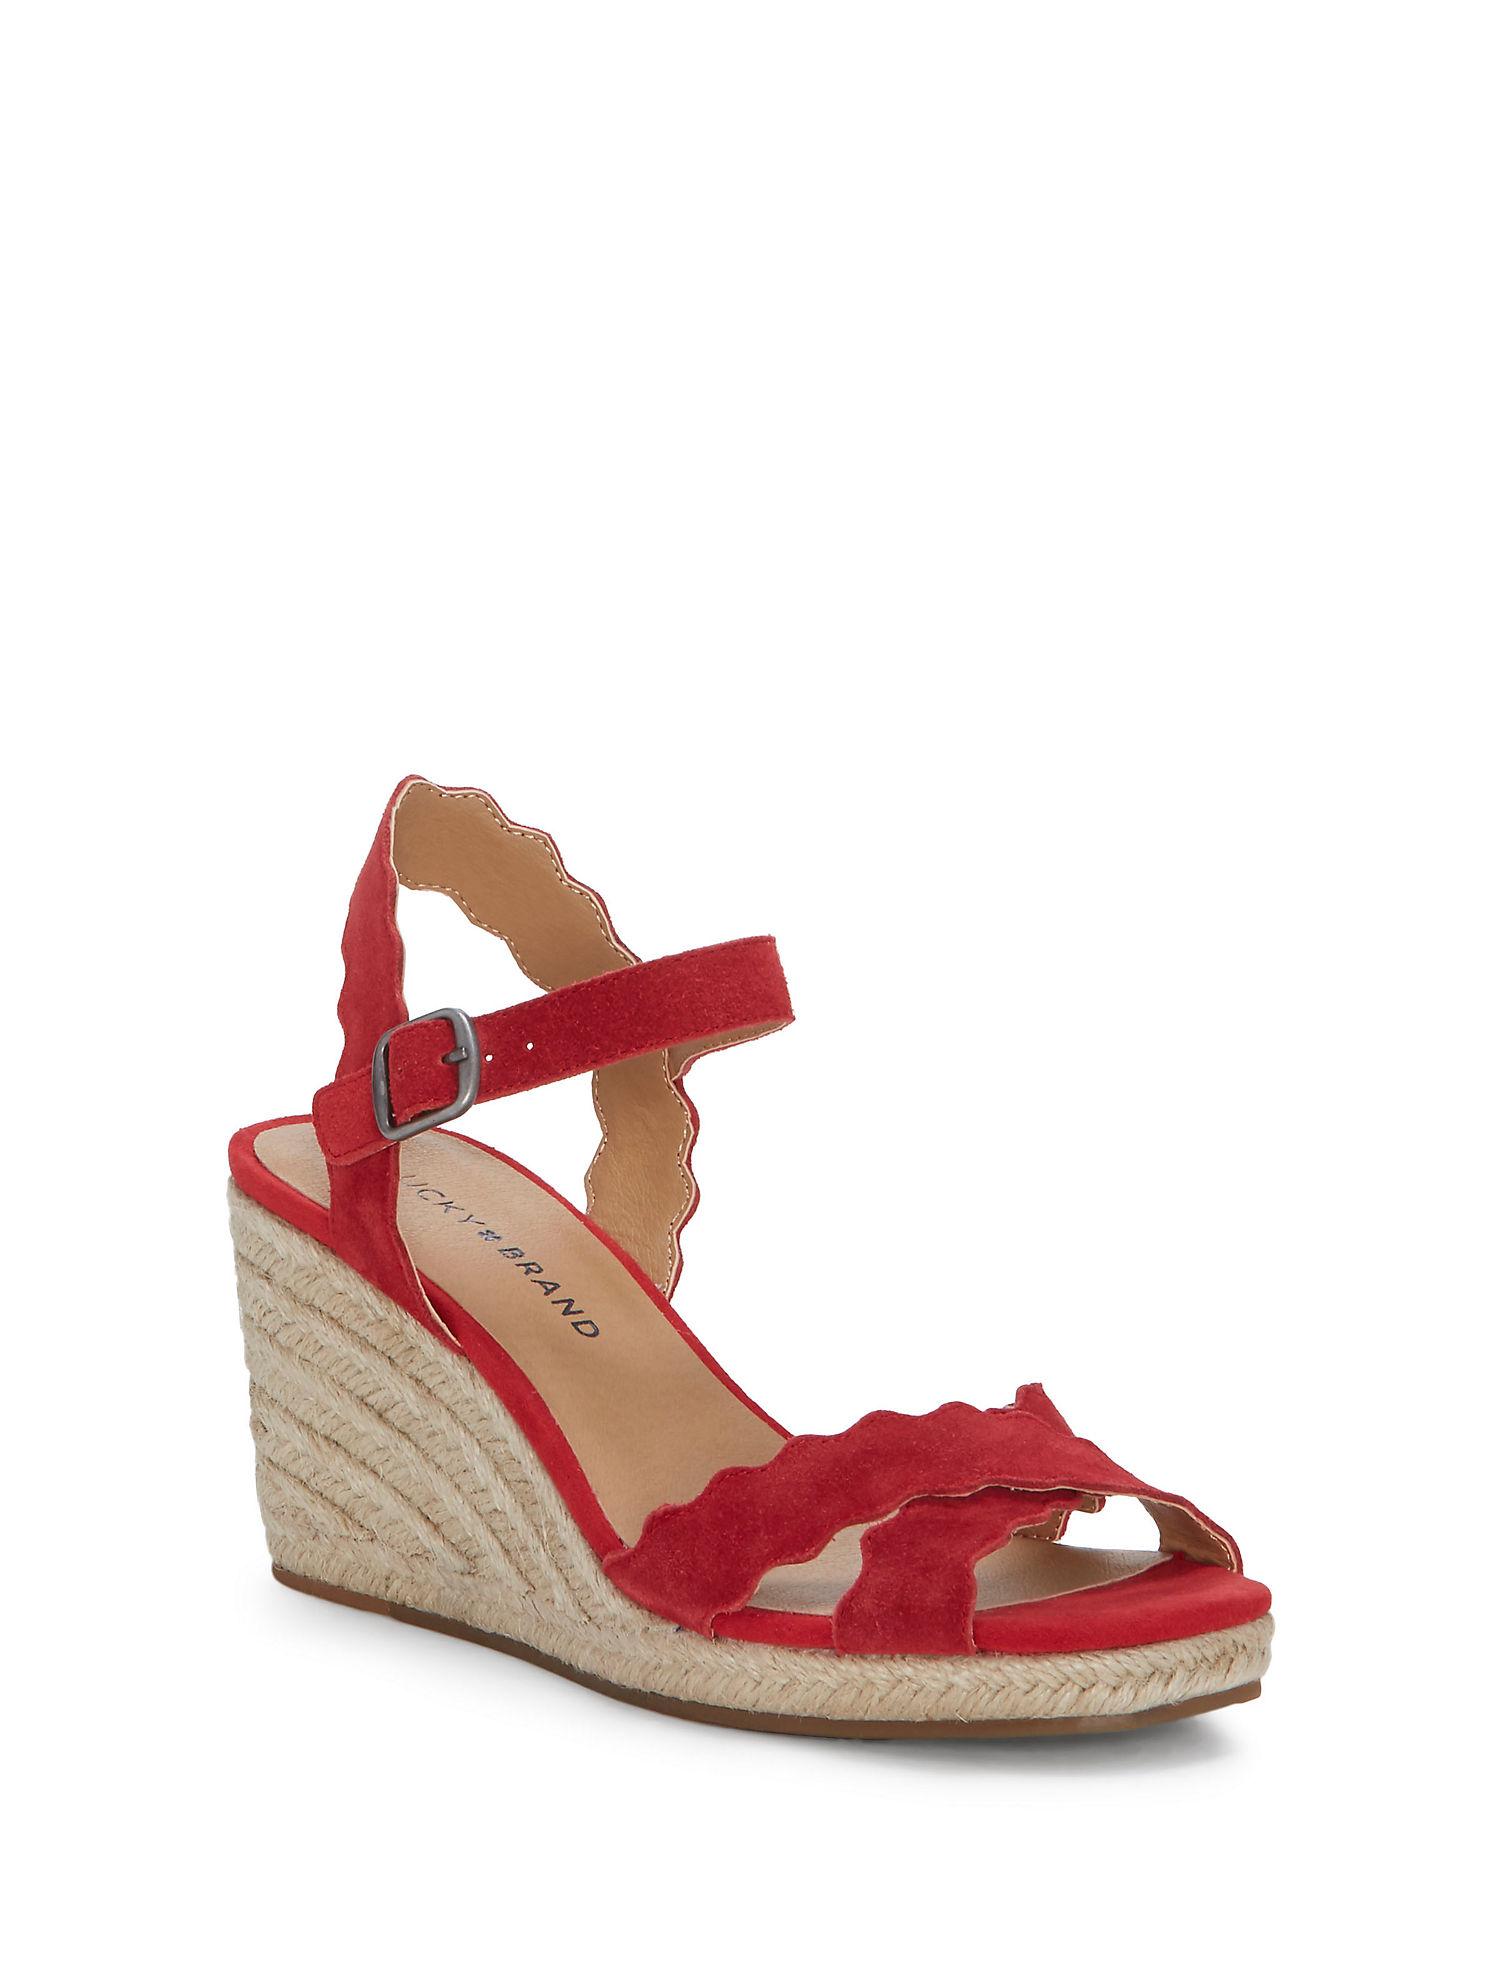 84bff3661090 Lucky Brand Marleigh Wedge Ankle Strap Sandal GUK224 - askkingoliver.com